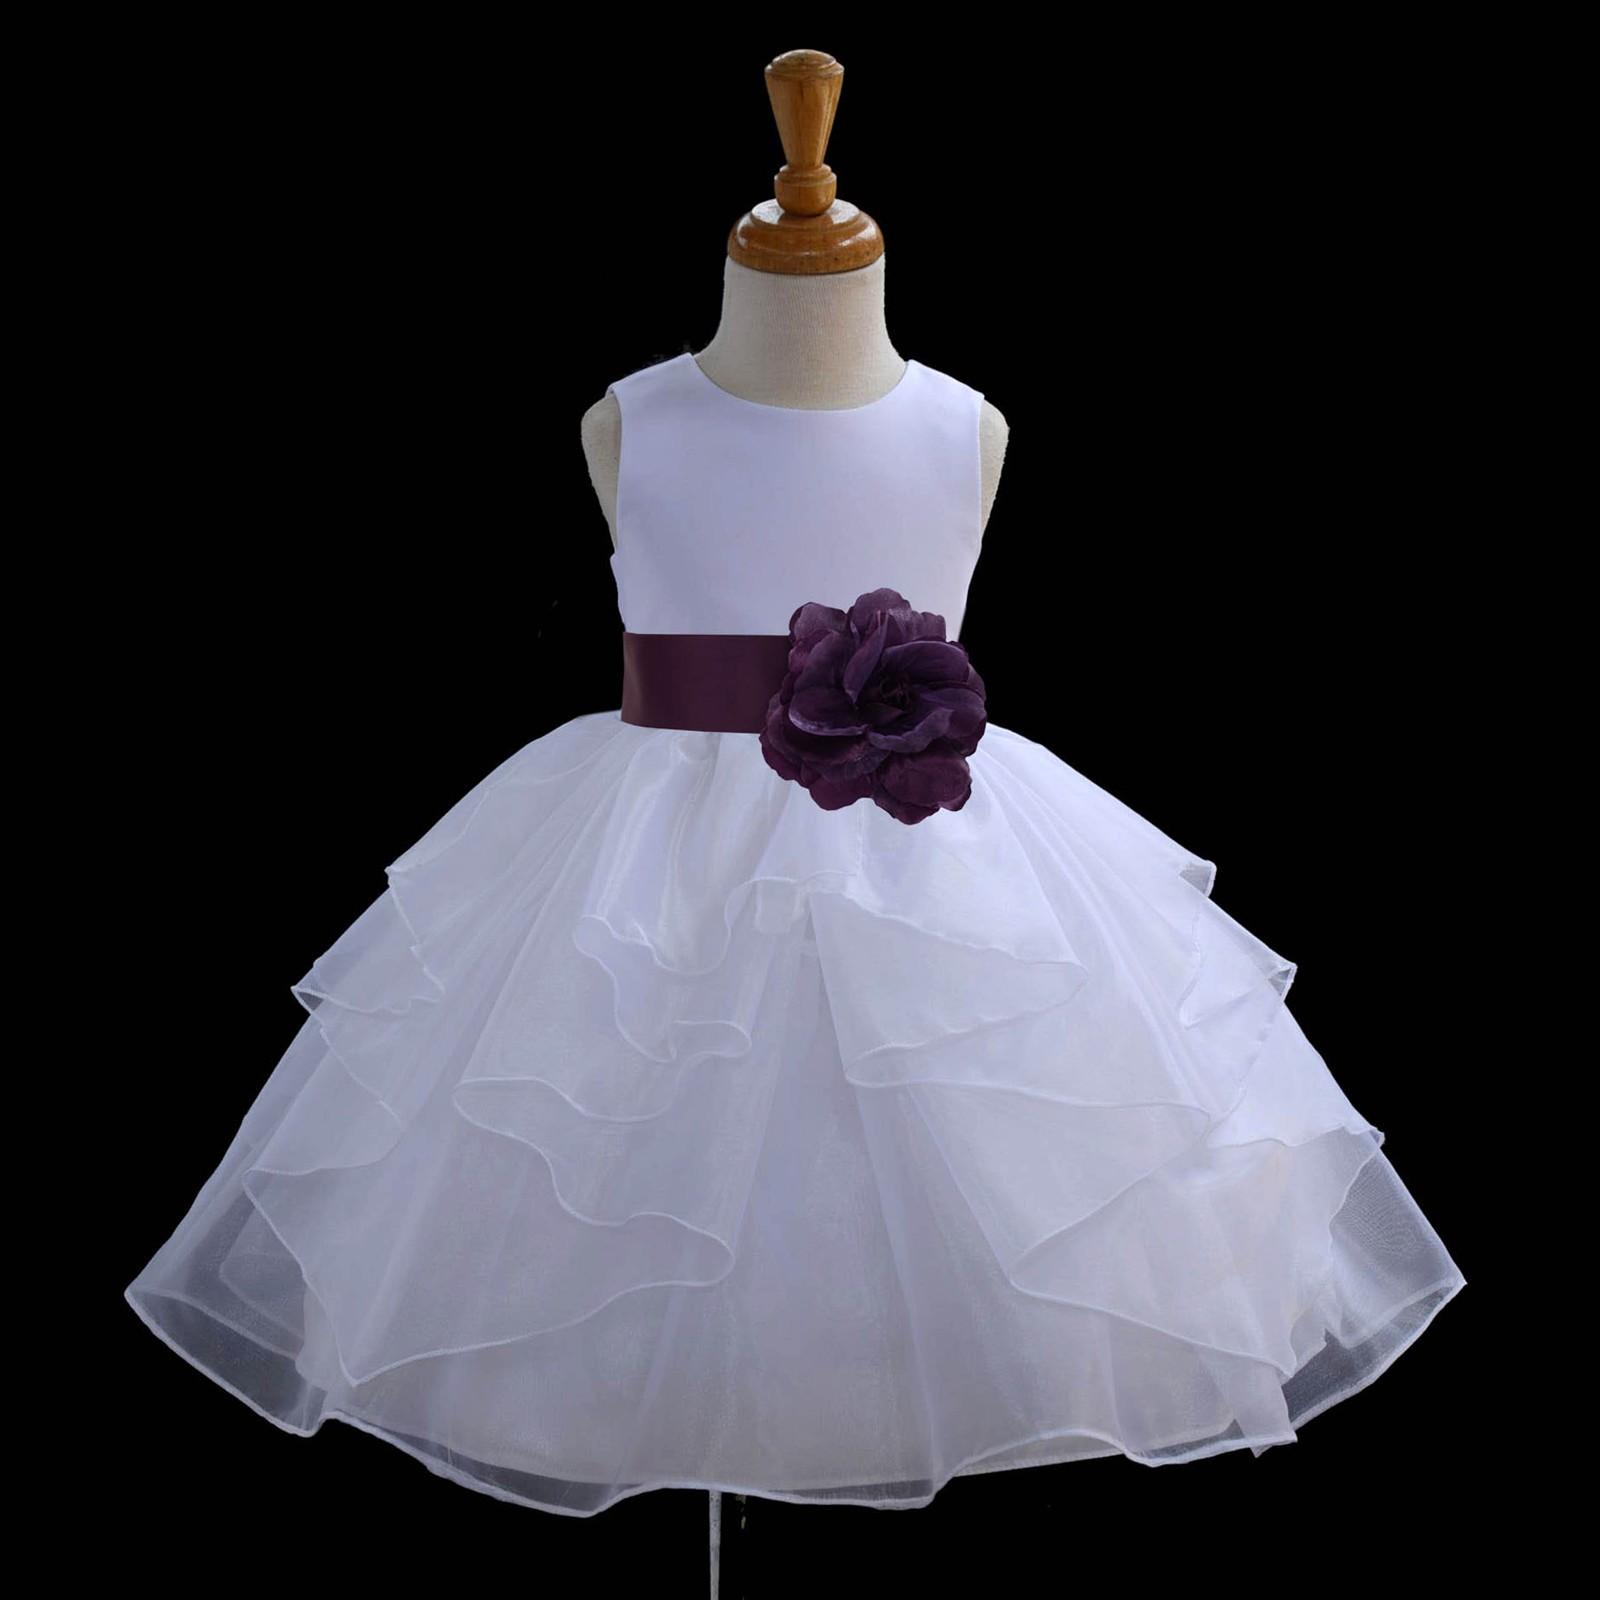 White/Plum Satin Shimmering Organza Flower Girl Dress Wedding 4613S